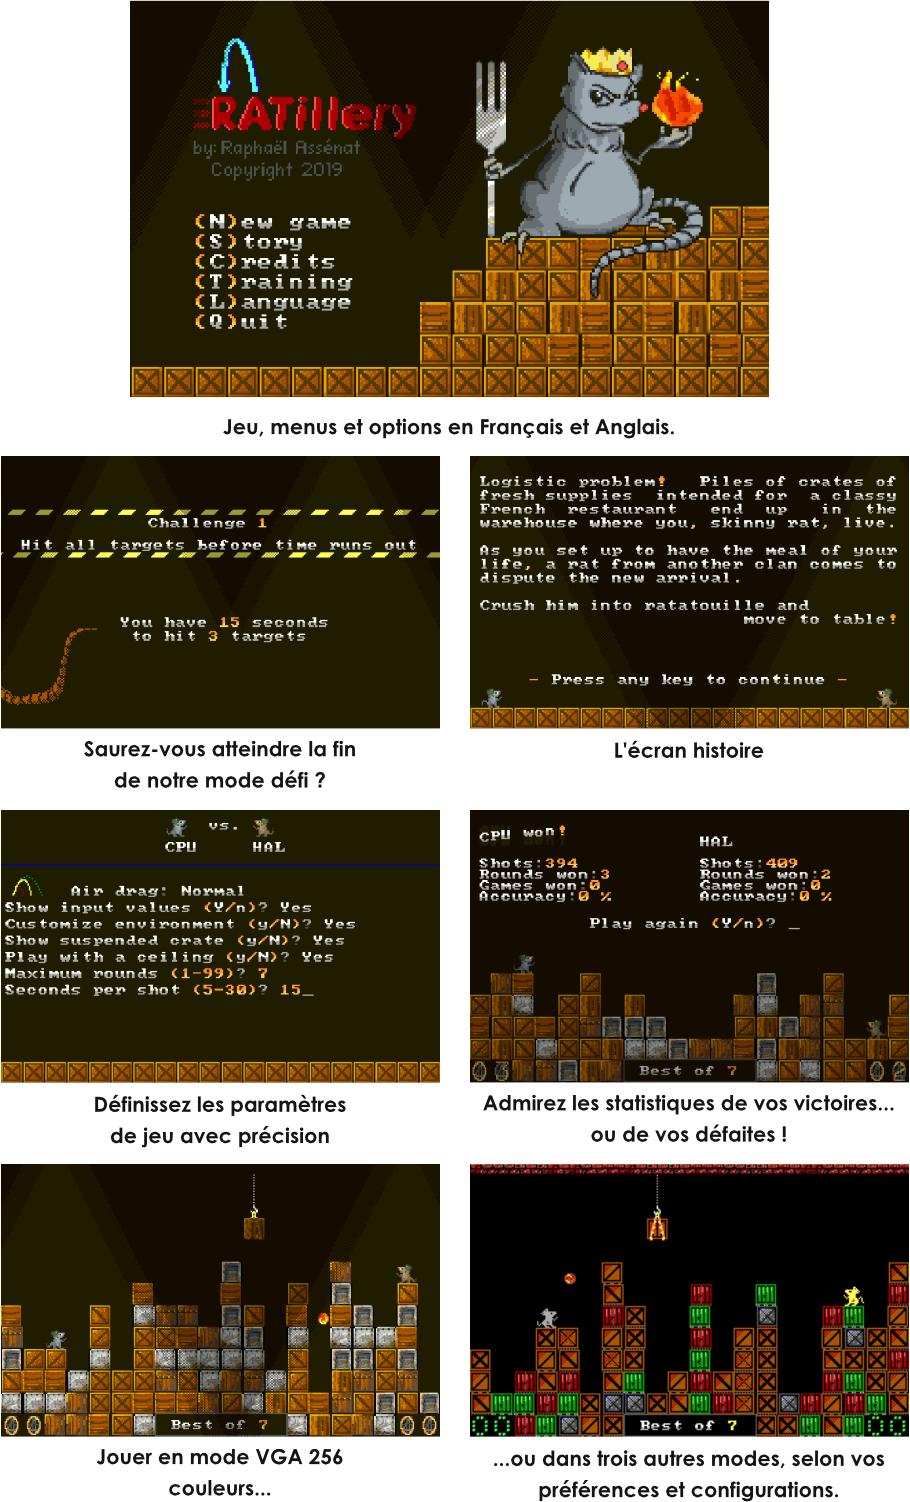 Ratillery for PC DOS menus